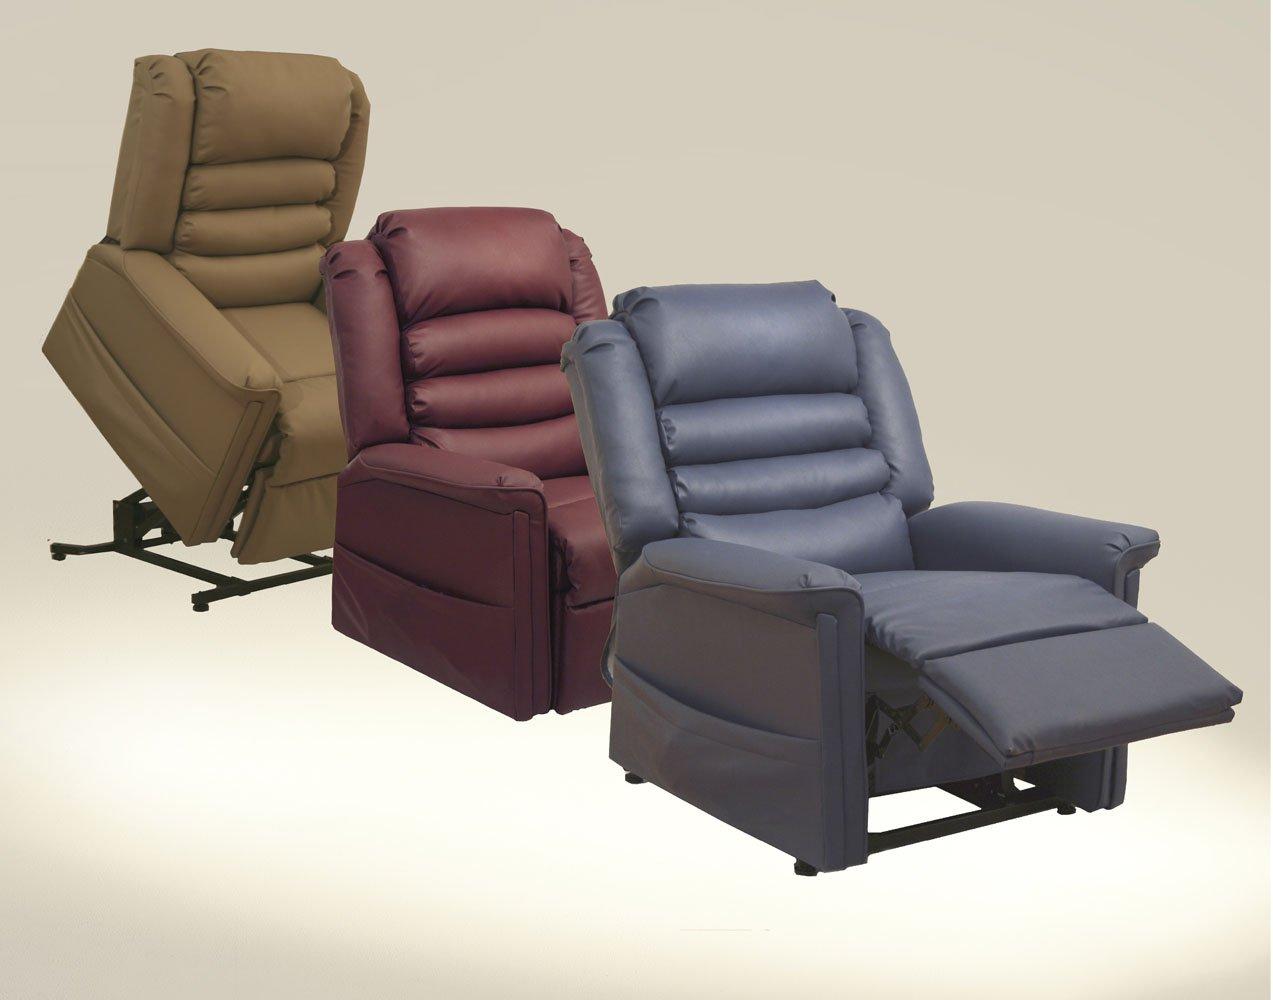 amazoncom invincible power lift recliner cabernet health u0026 personal care